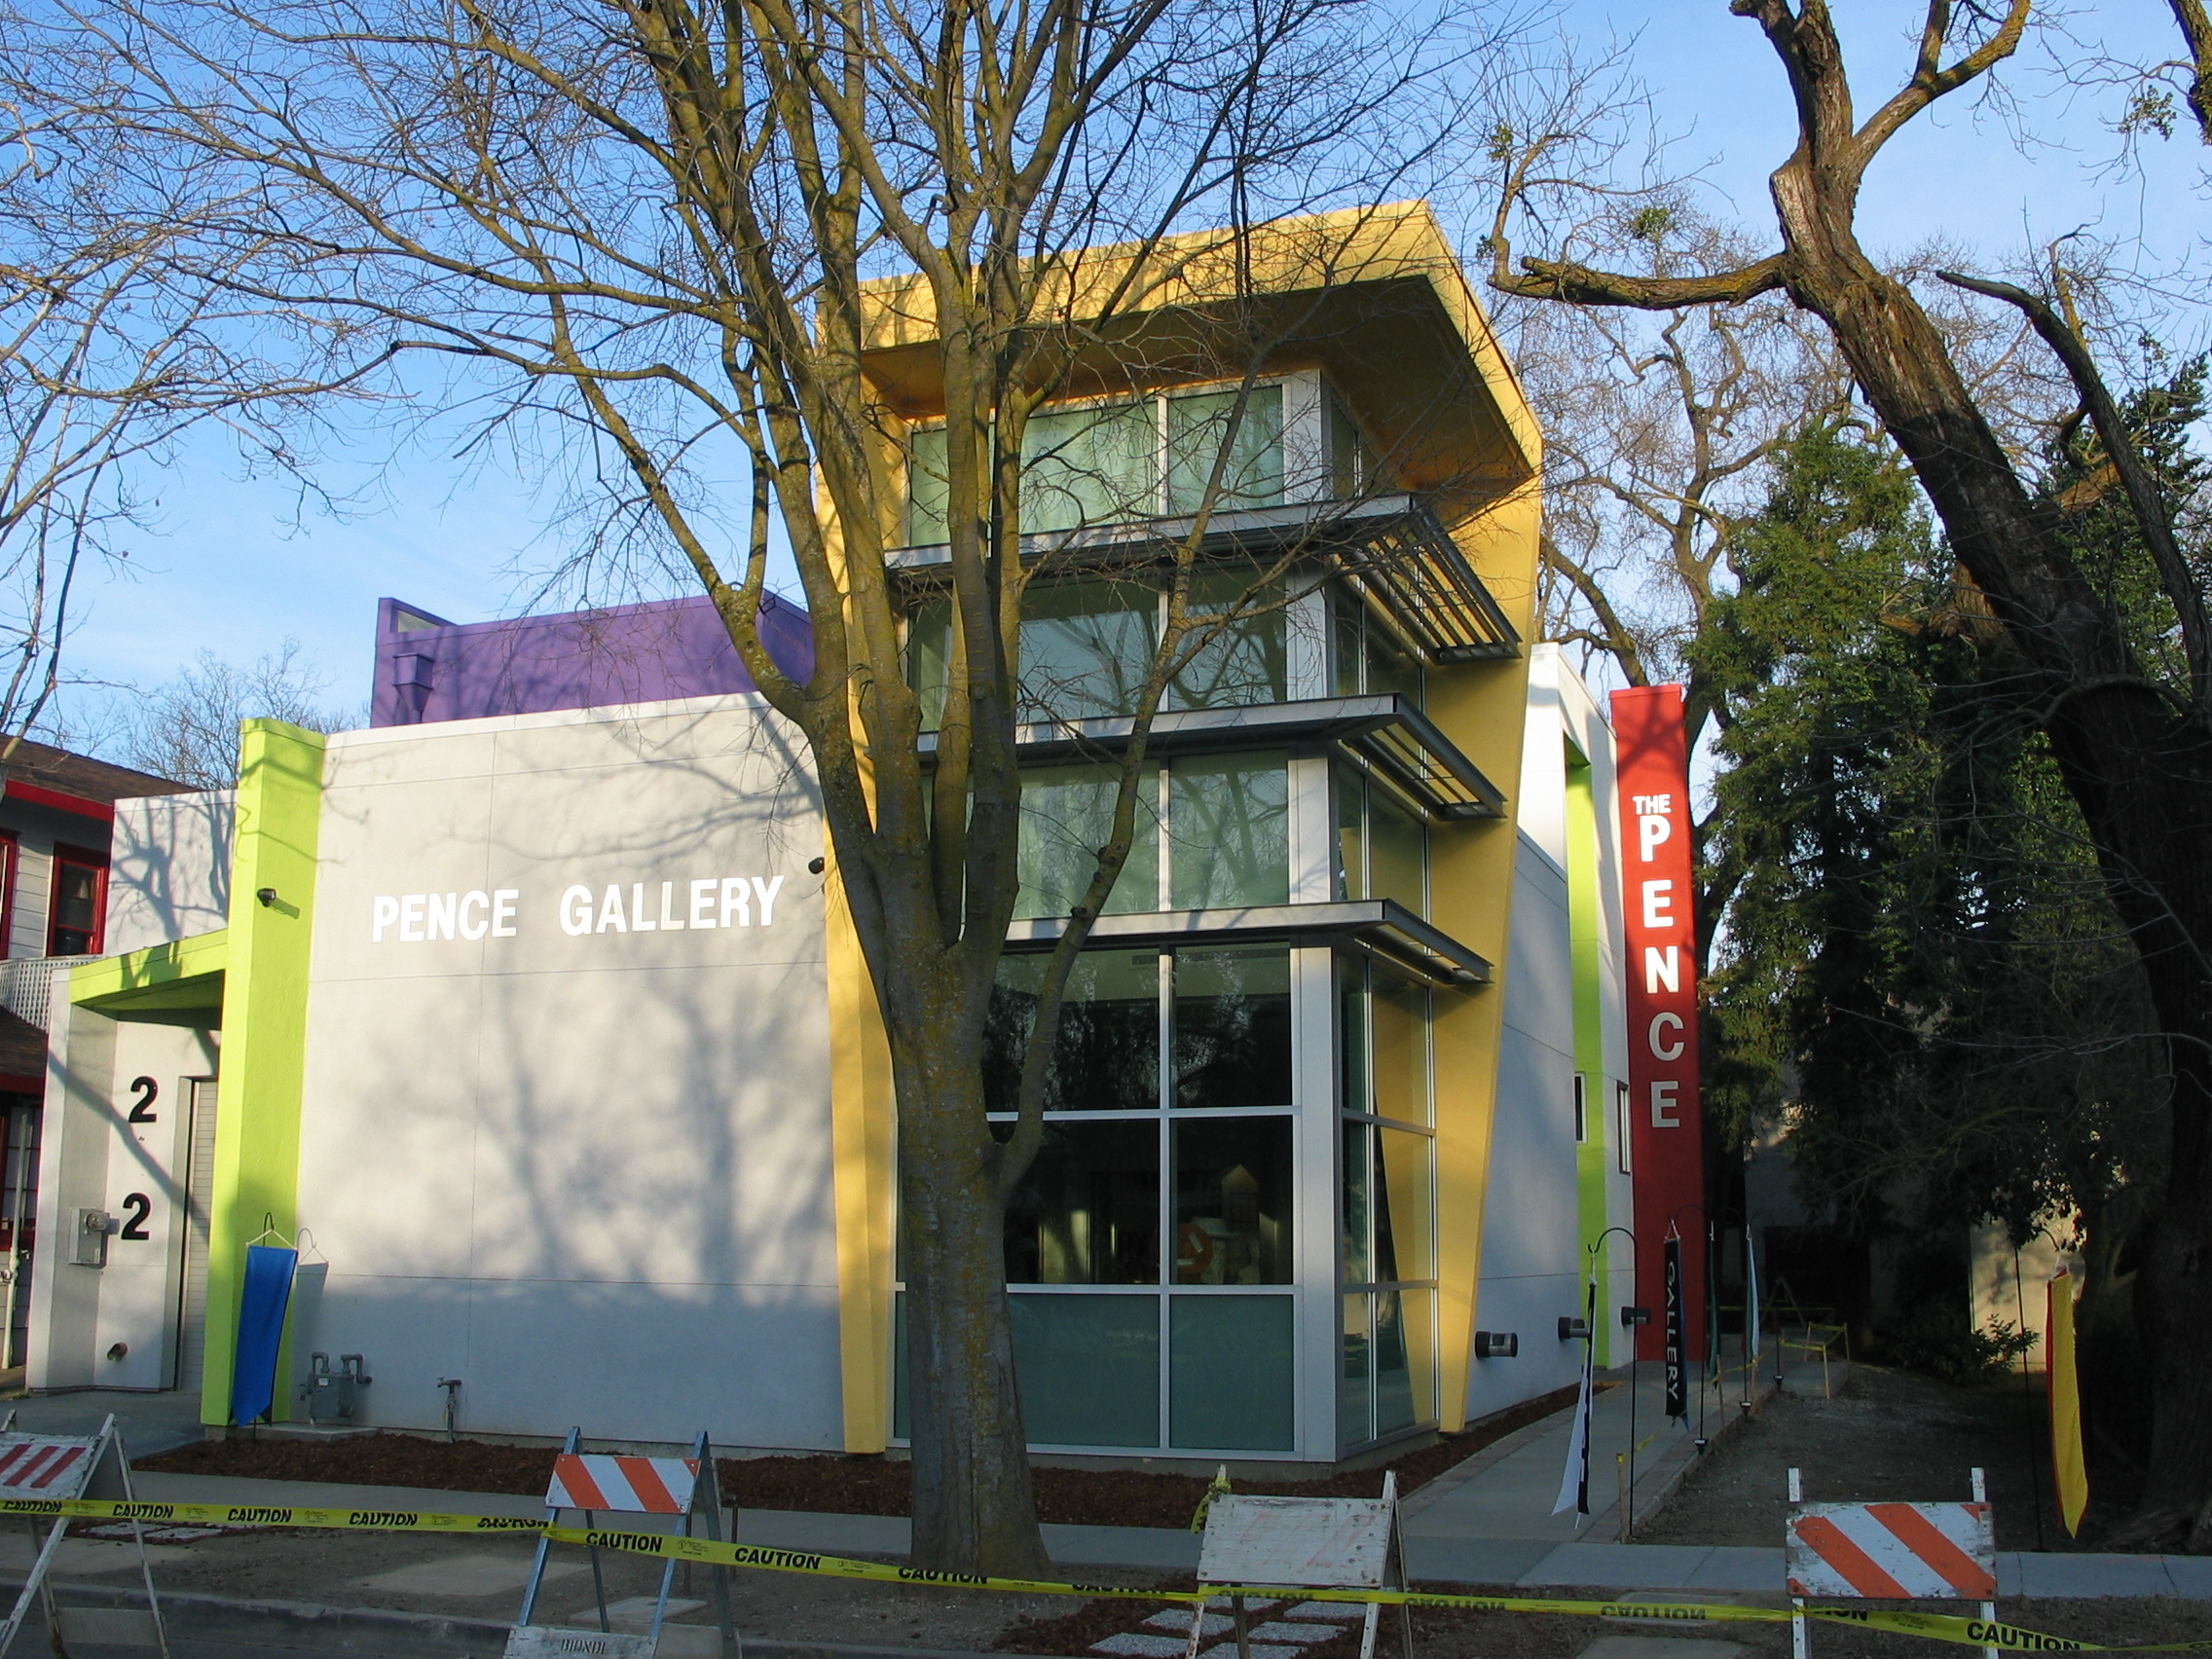 Pence Gallery Davis